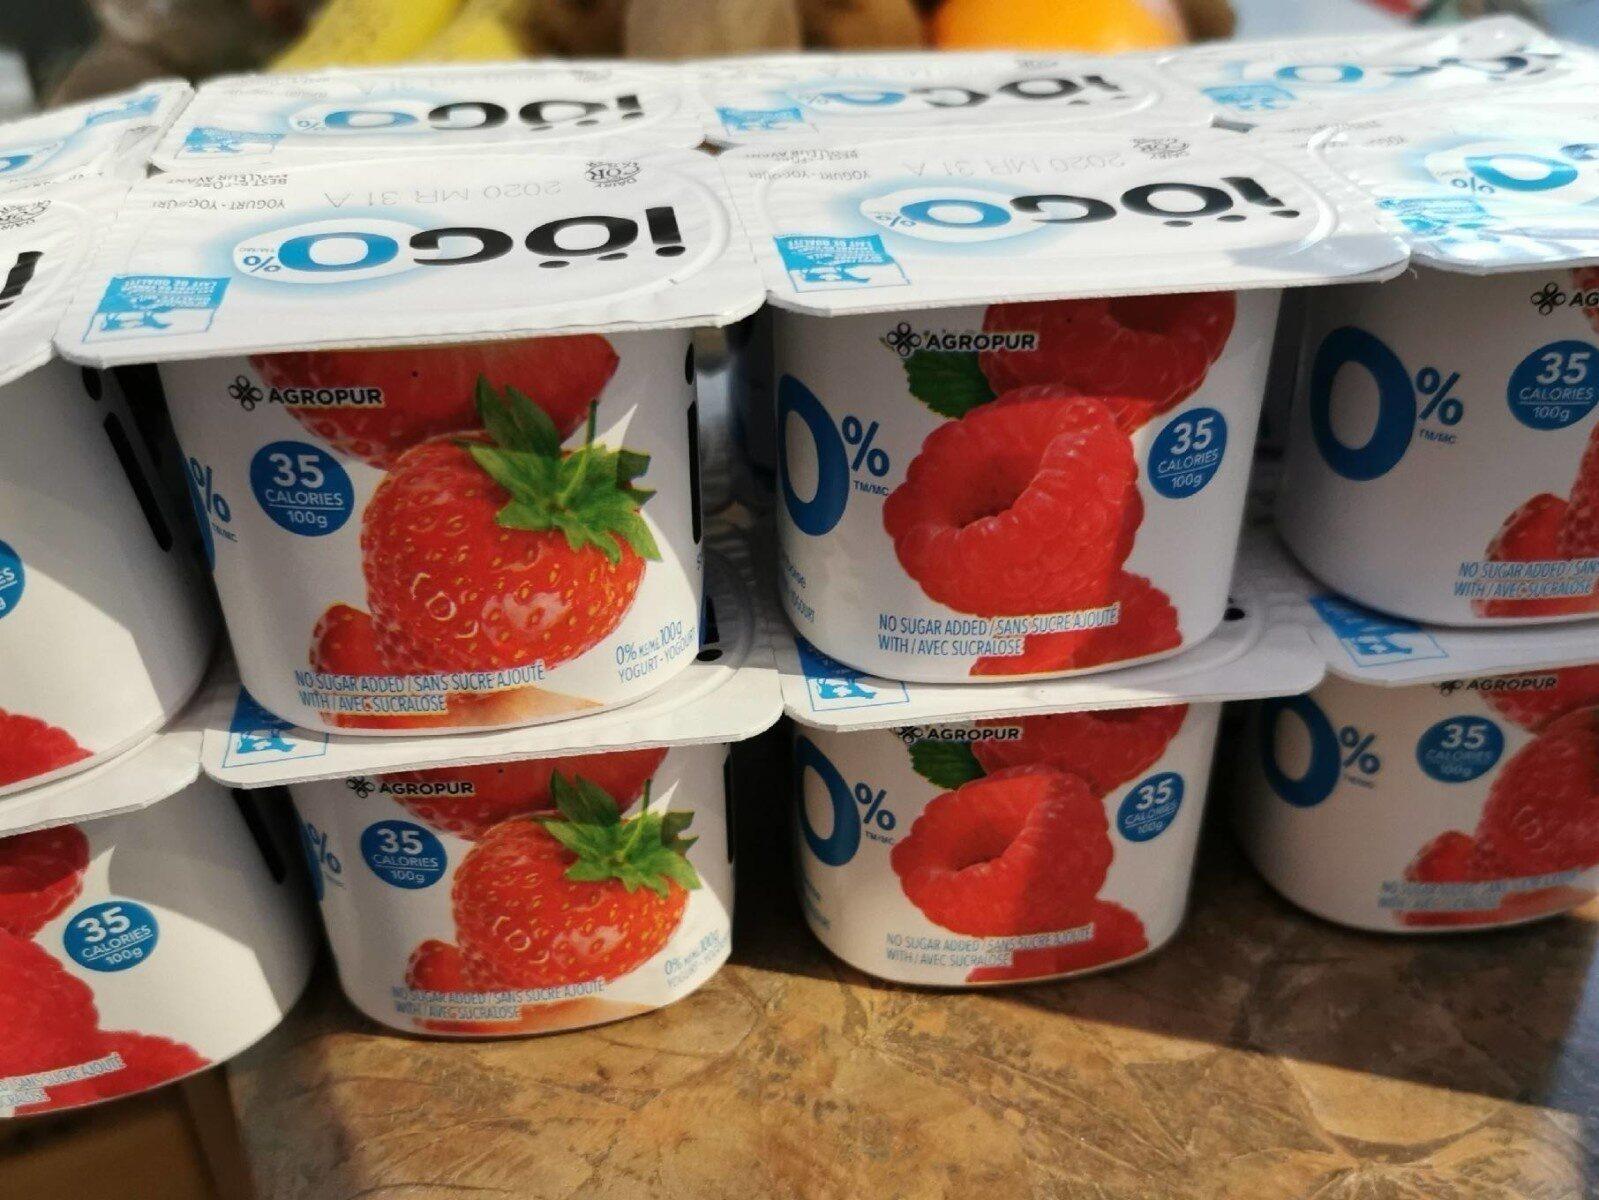 Yogourt Iogo 0% (4 Variétées) - Produit - fr